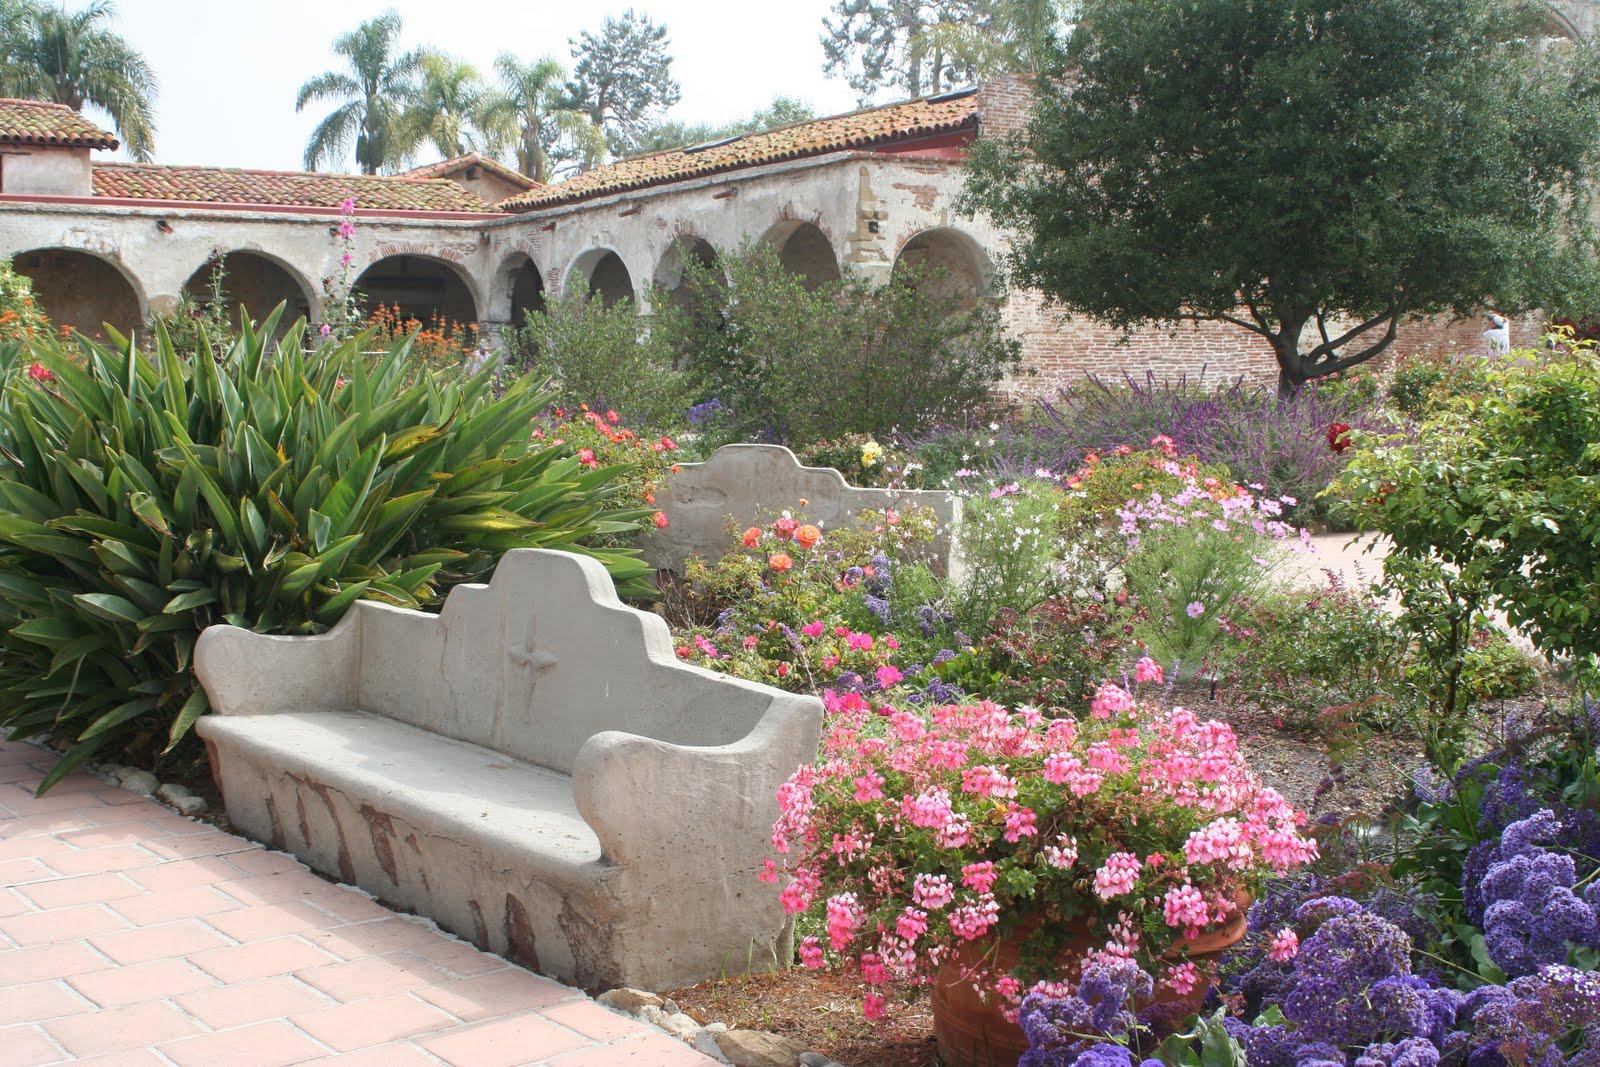 Western Sojourns: Travels With Camissonia: MISSION SAN JUAN CAPISTRANO (San  Juan Capistrano, Orange County, CA)